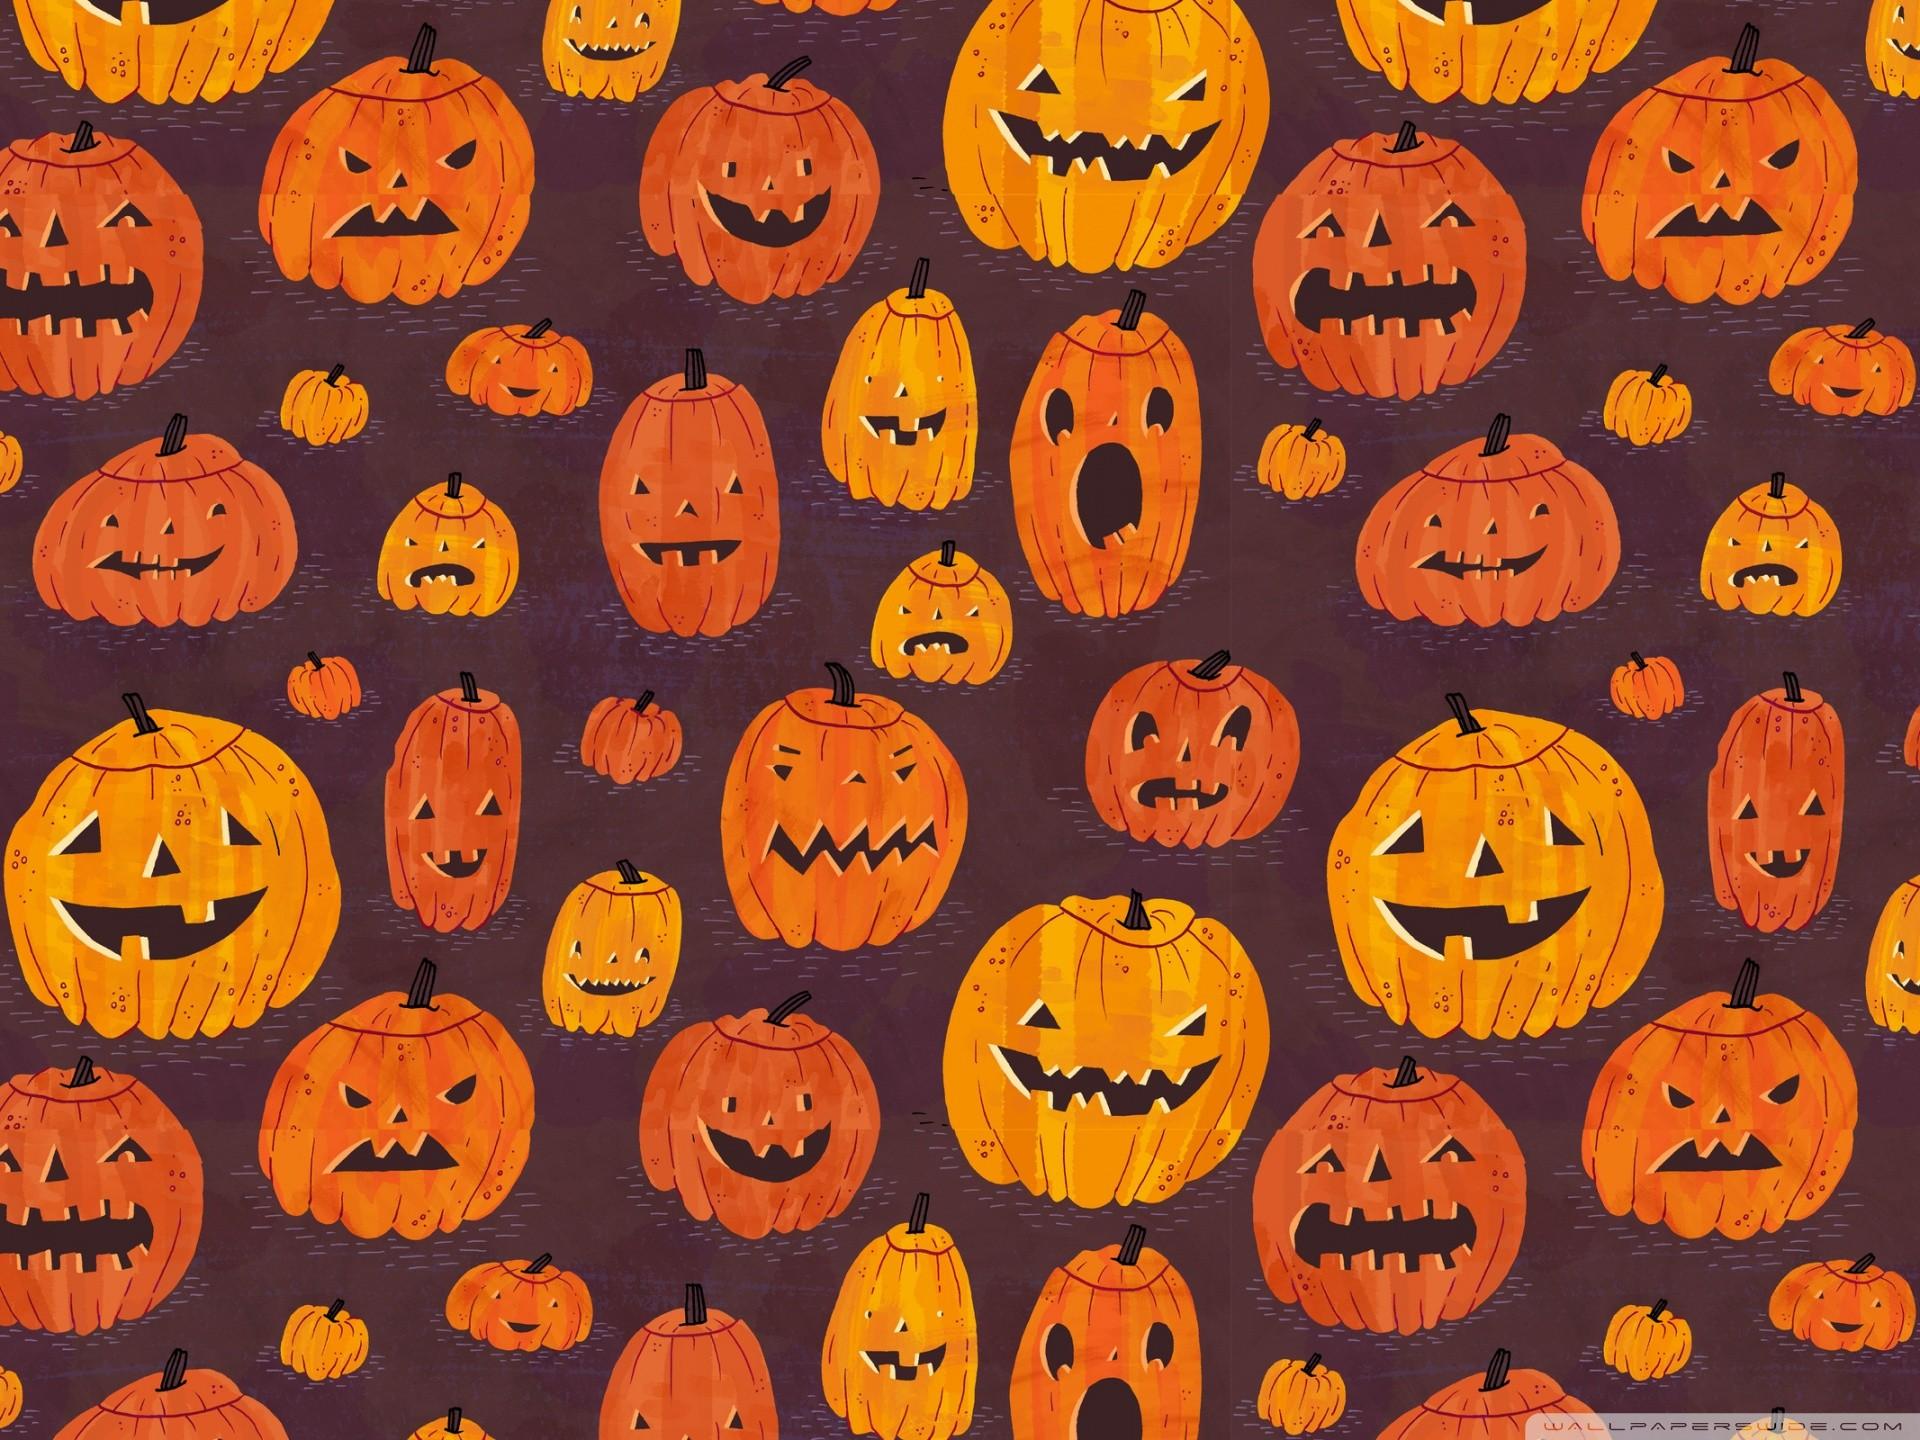 Great Wallpaper Halloween Puppy - 486805  Image_347181.jpg